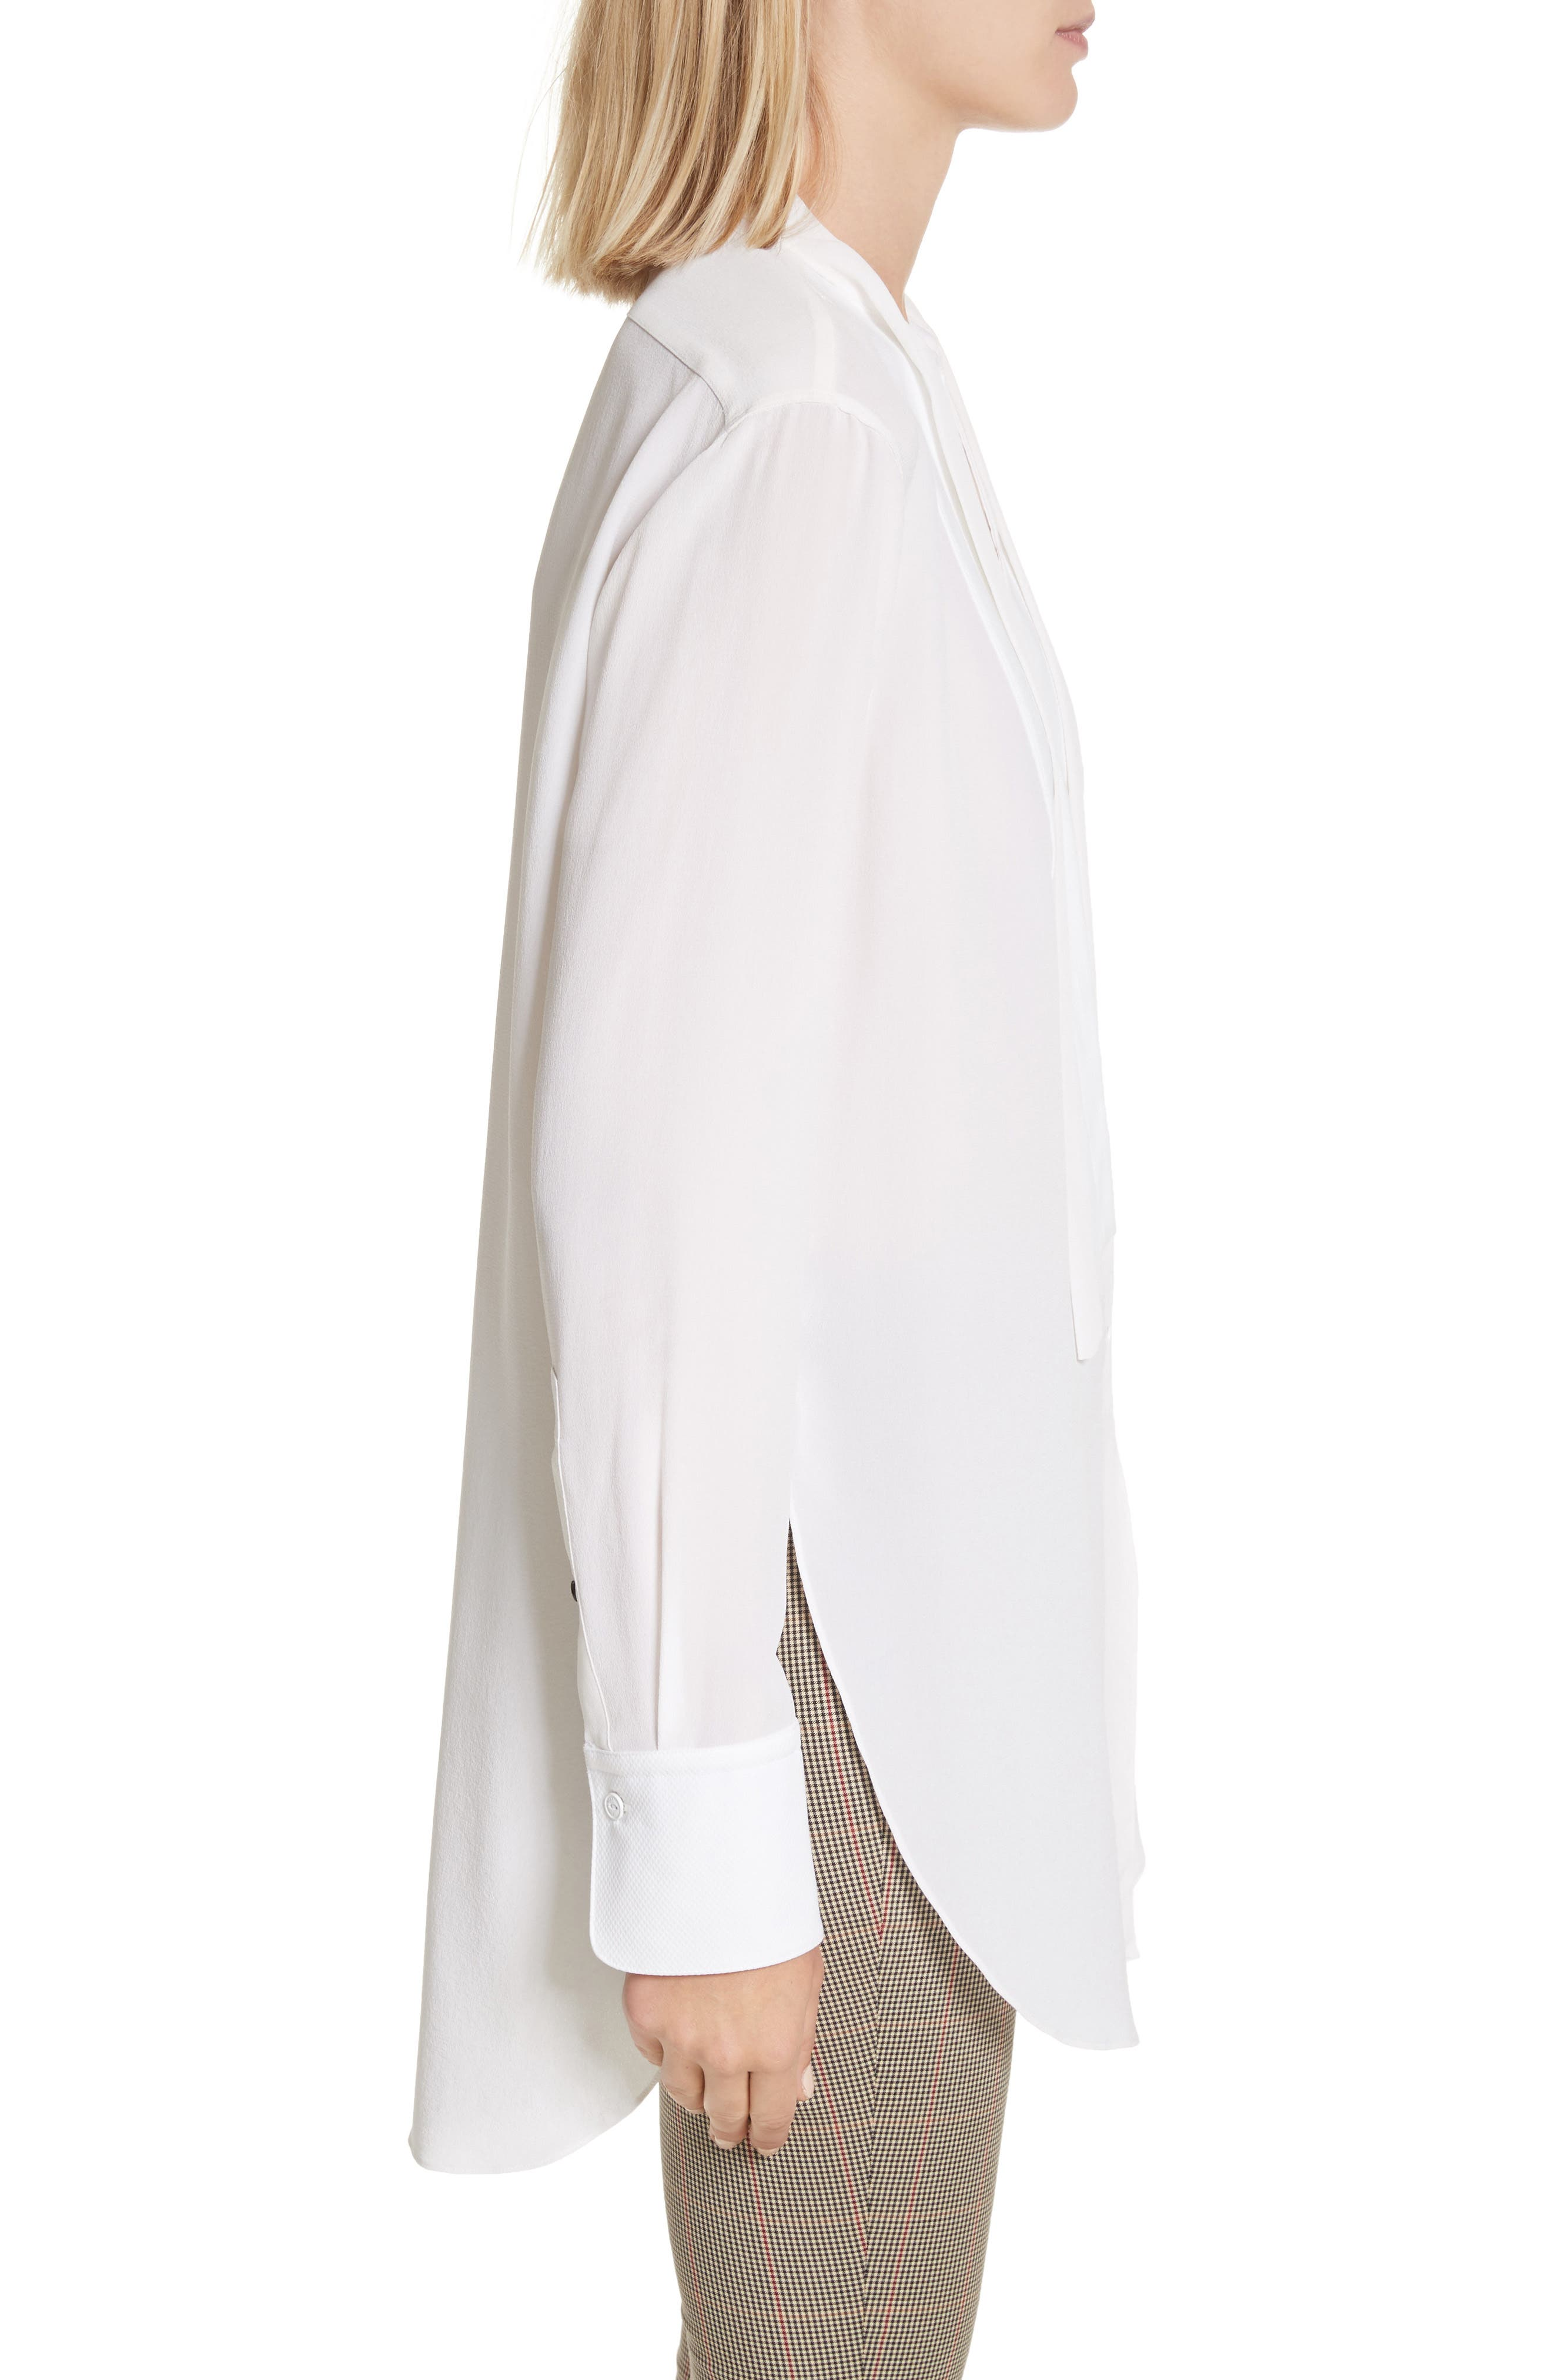 Frida Silk Tuxedo Blouse,                             Alternate thumbnail 4, color,                             White